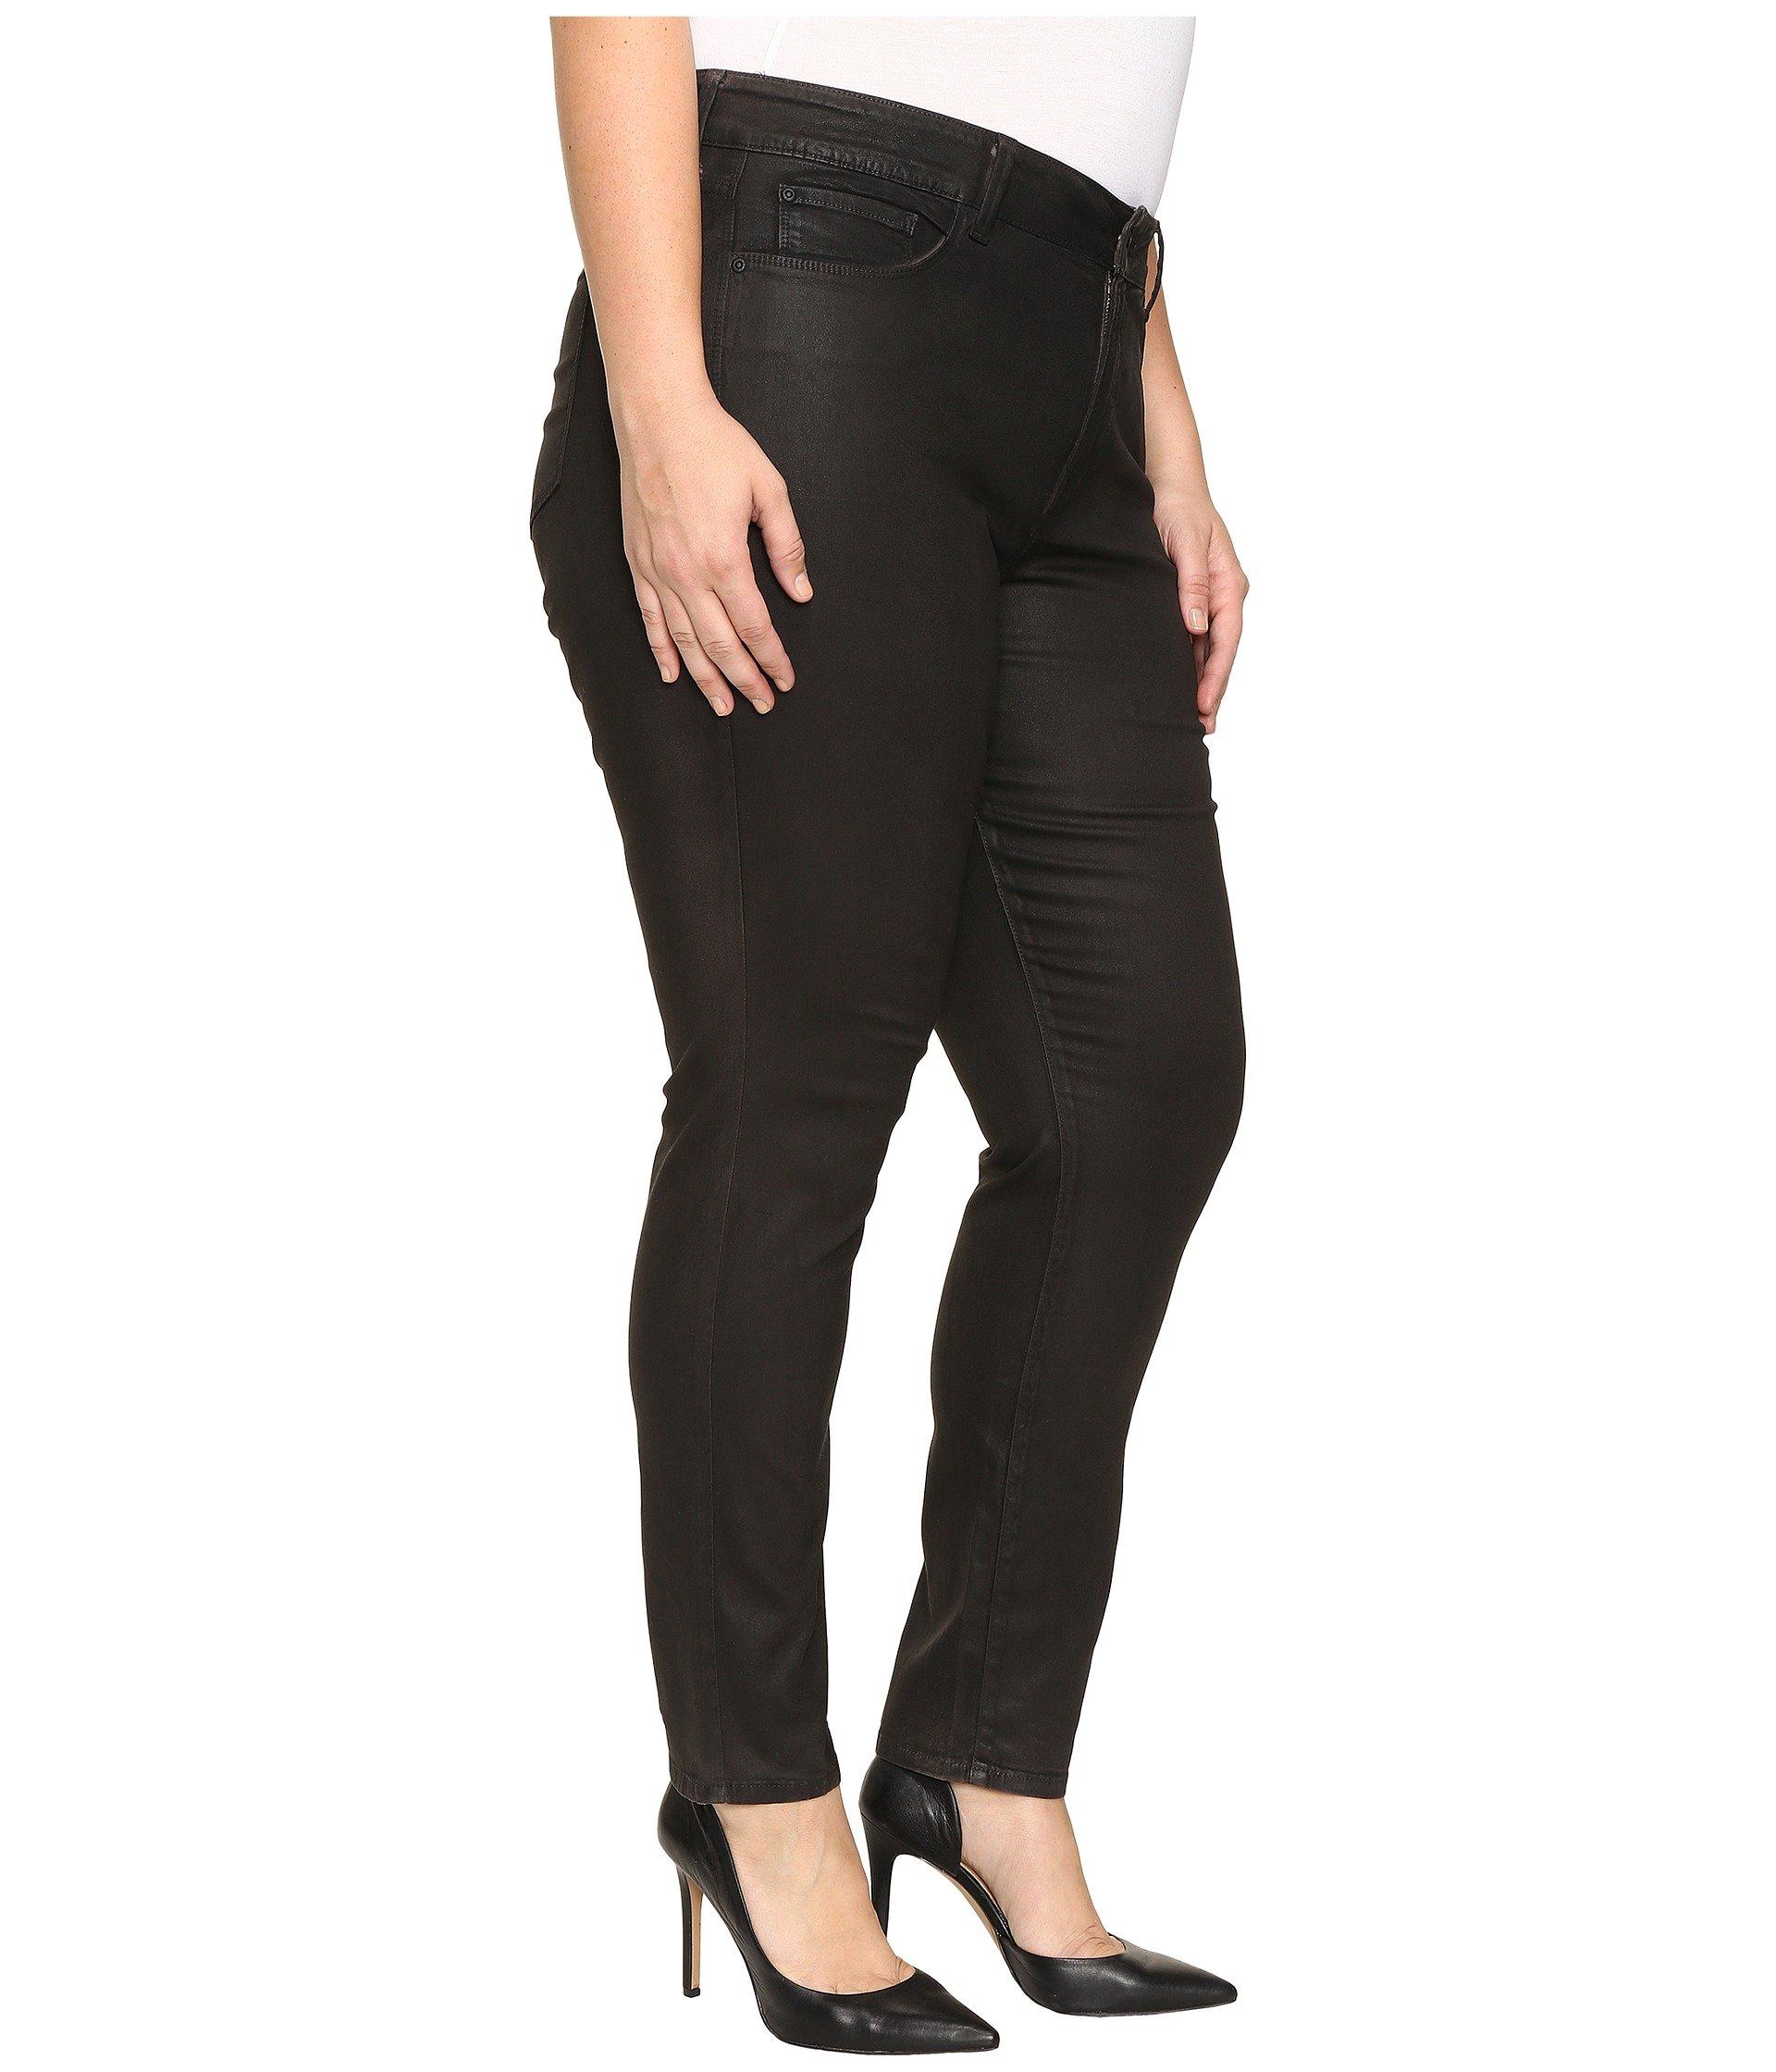 1920x2240 Nydj Plus Size Women's Clothing Plus Size Alina Legging Jeans